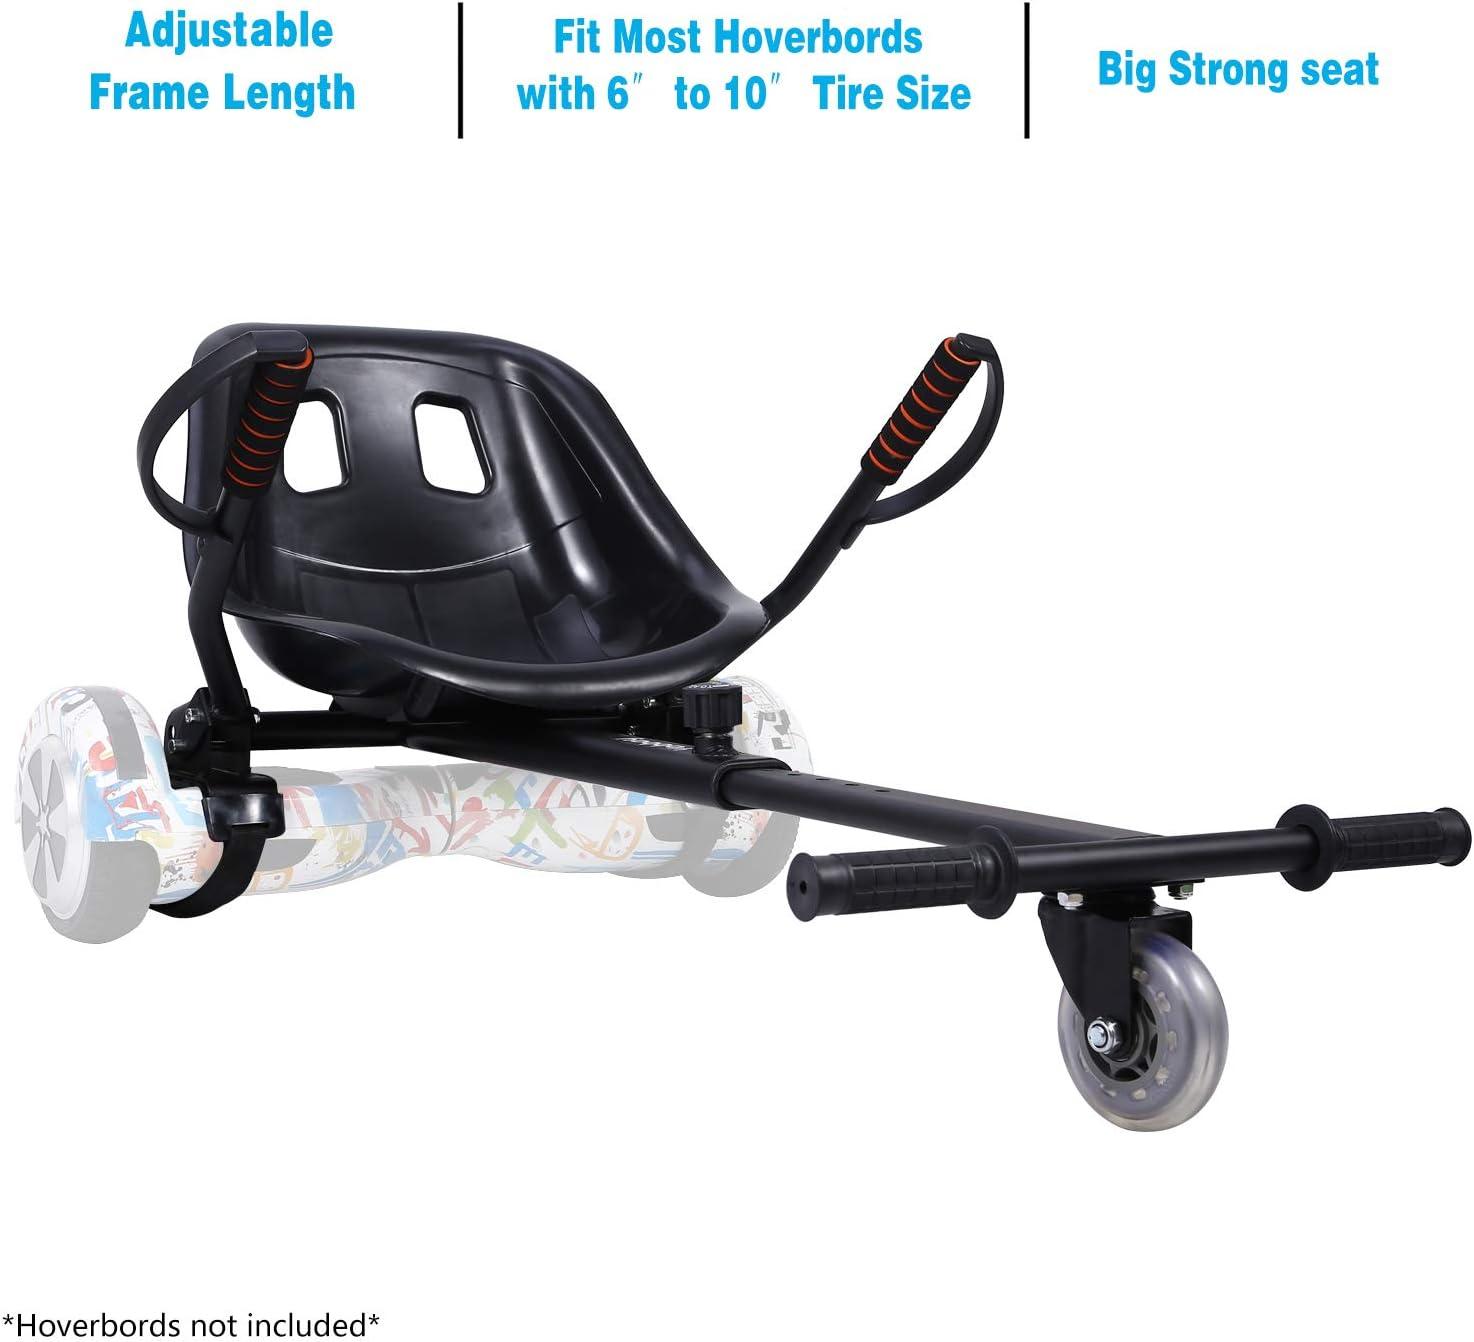 Plastic Seat Straps for Balance Scooter HoverKart Gokart Holder Attachment